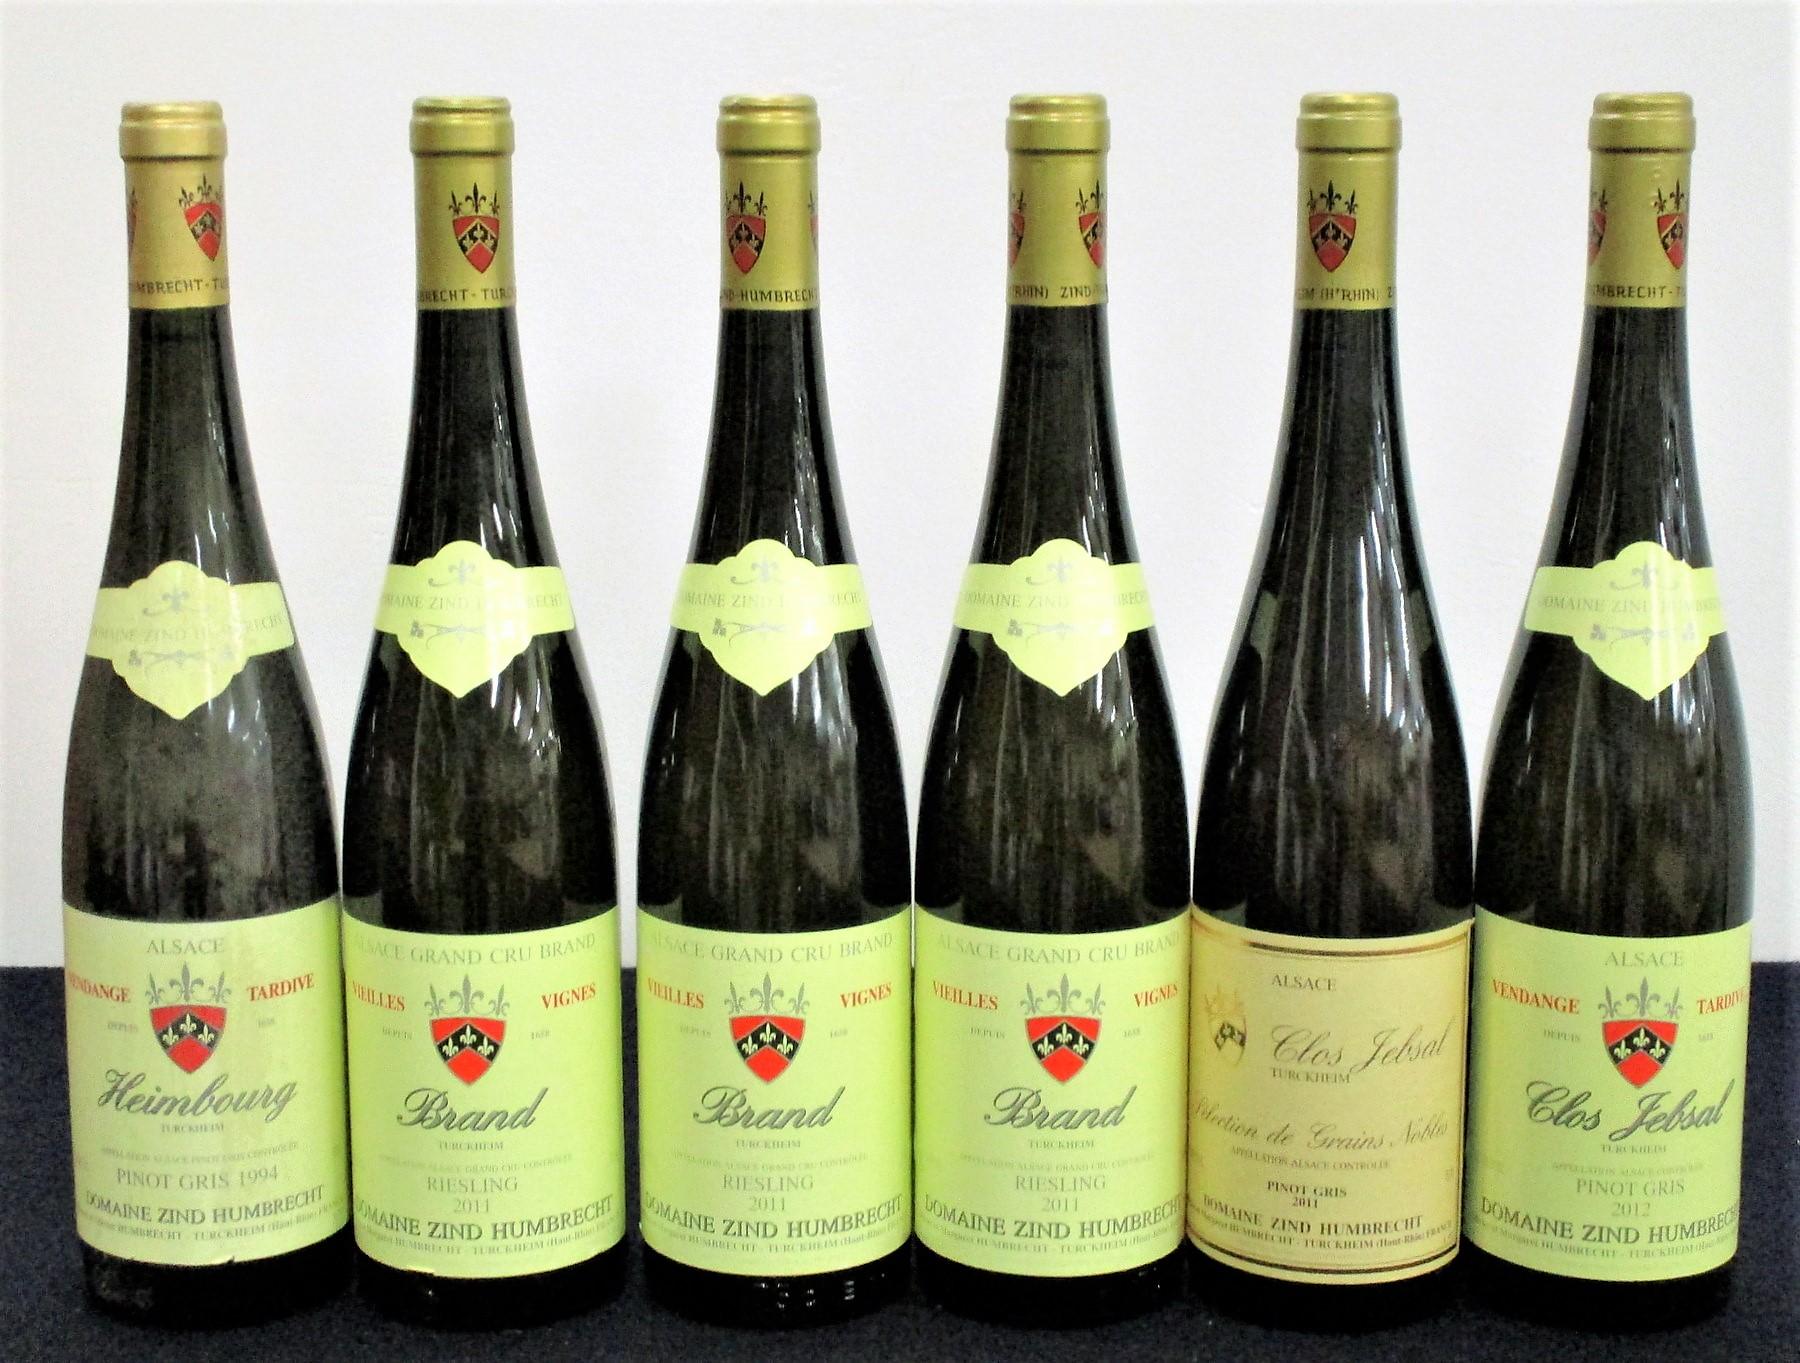 1 bt bt Dom Zind Humbrecht Heimbourg Turckheim Pinot Gris Vendange Tardive 1994 sl bs 3 bts Dom Zind